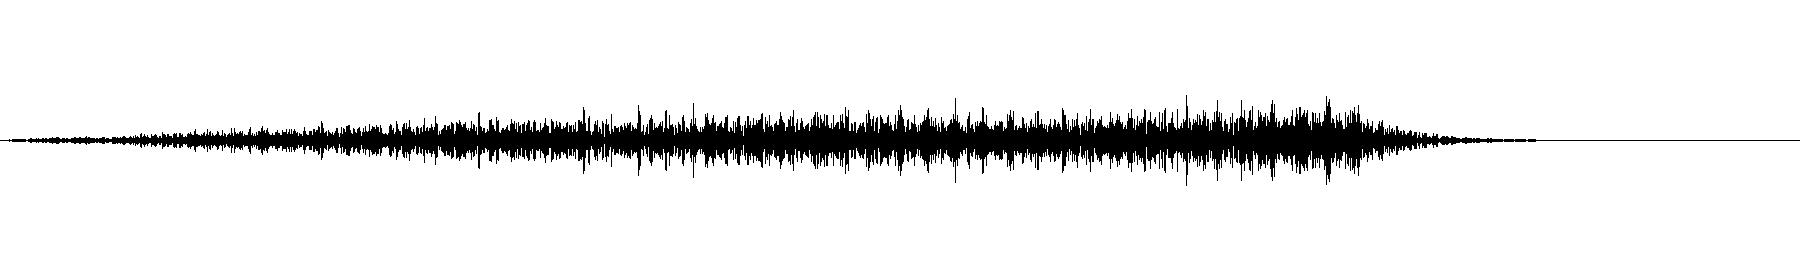 morphe pads  major j7